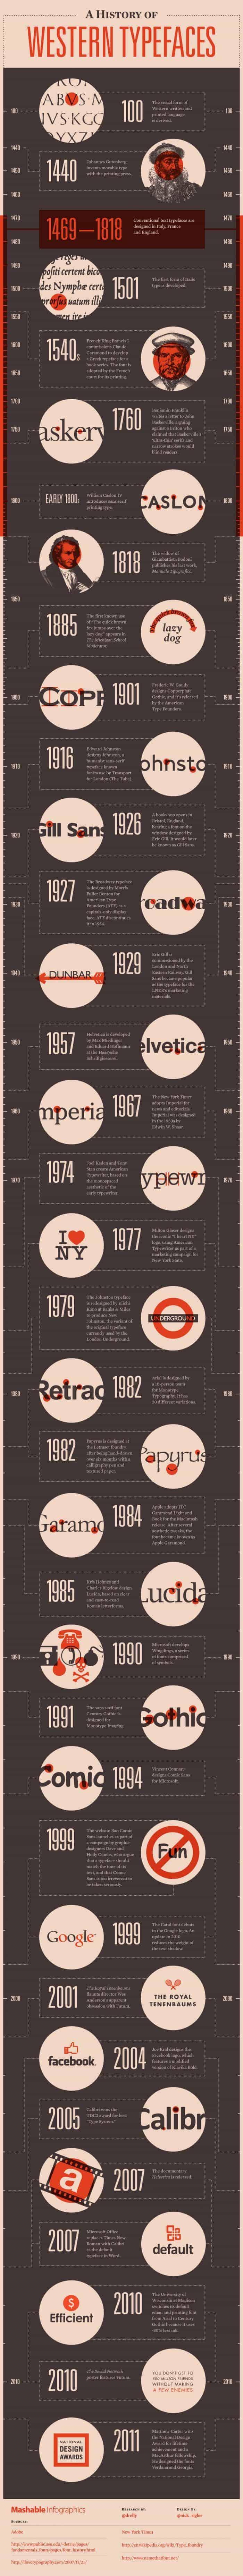 mashable_infographic_history-western-typefaces2